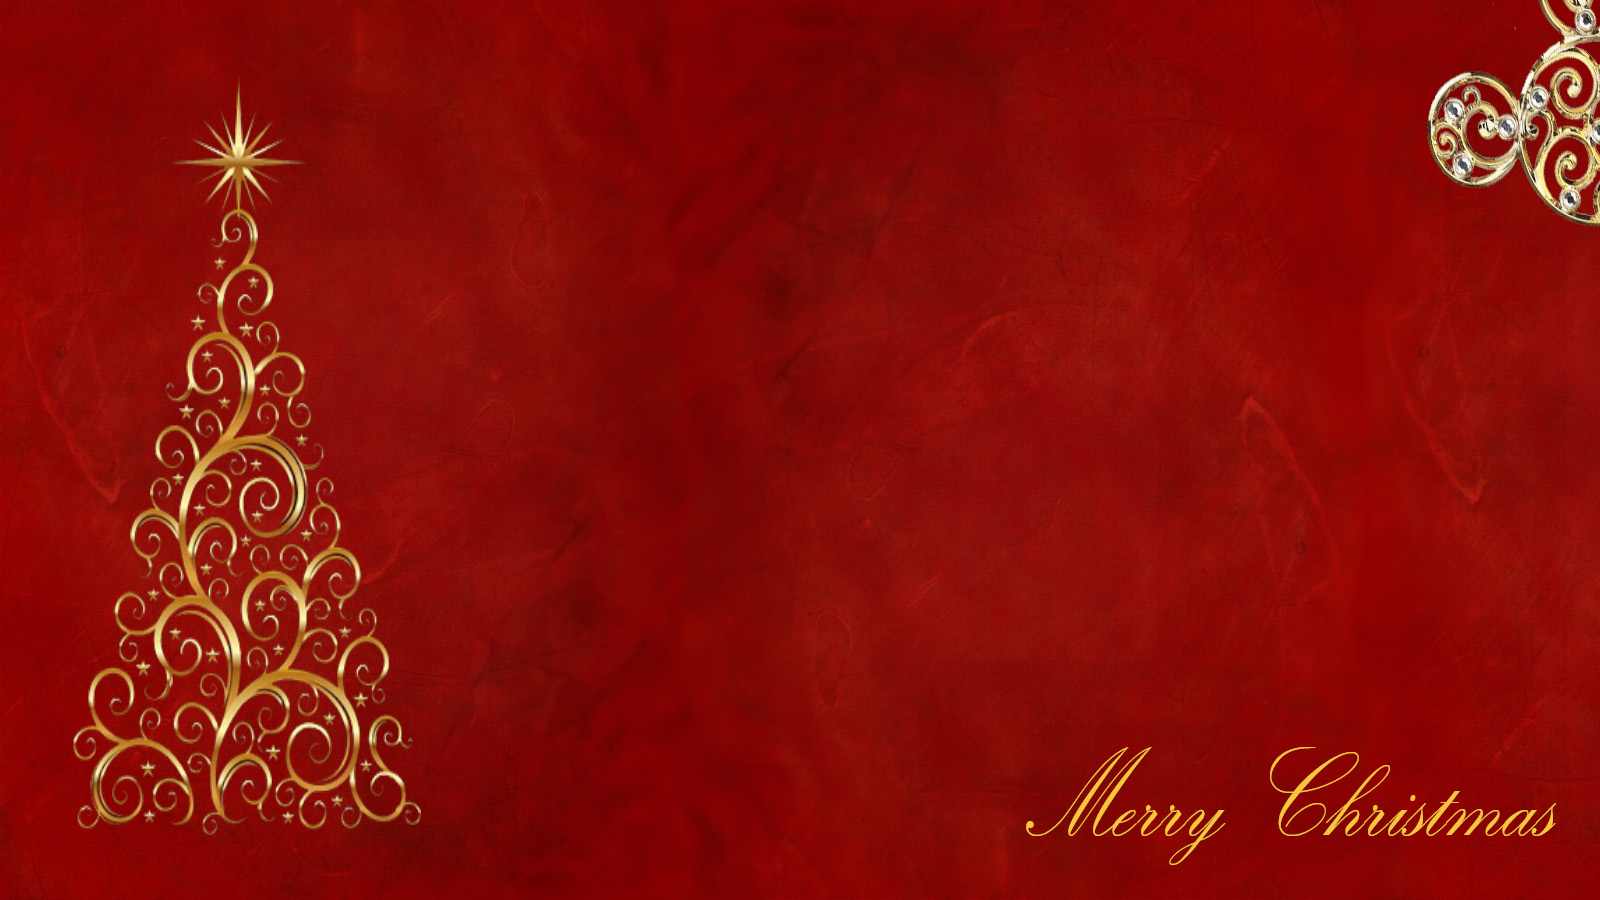 Christmas Backgrounds 2016 - Christmas 2016 Backgrounds ...